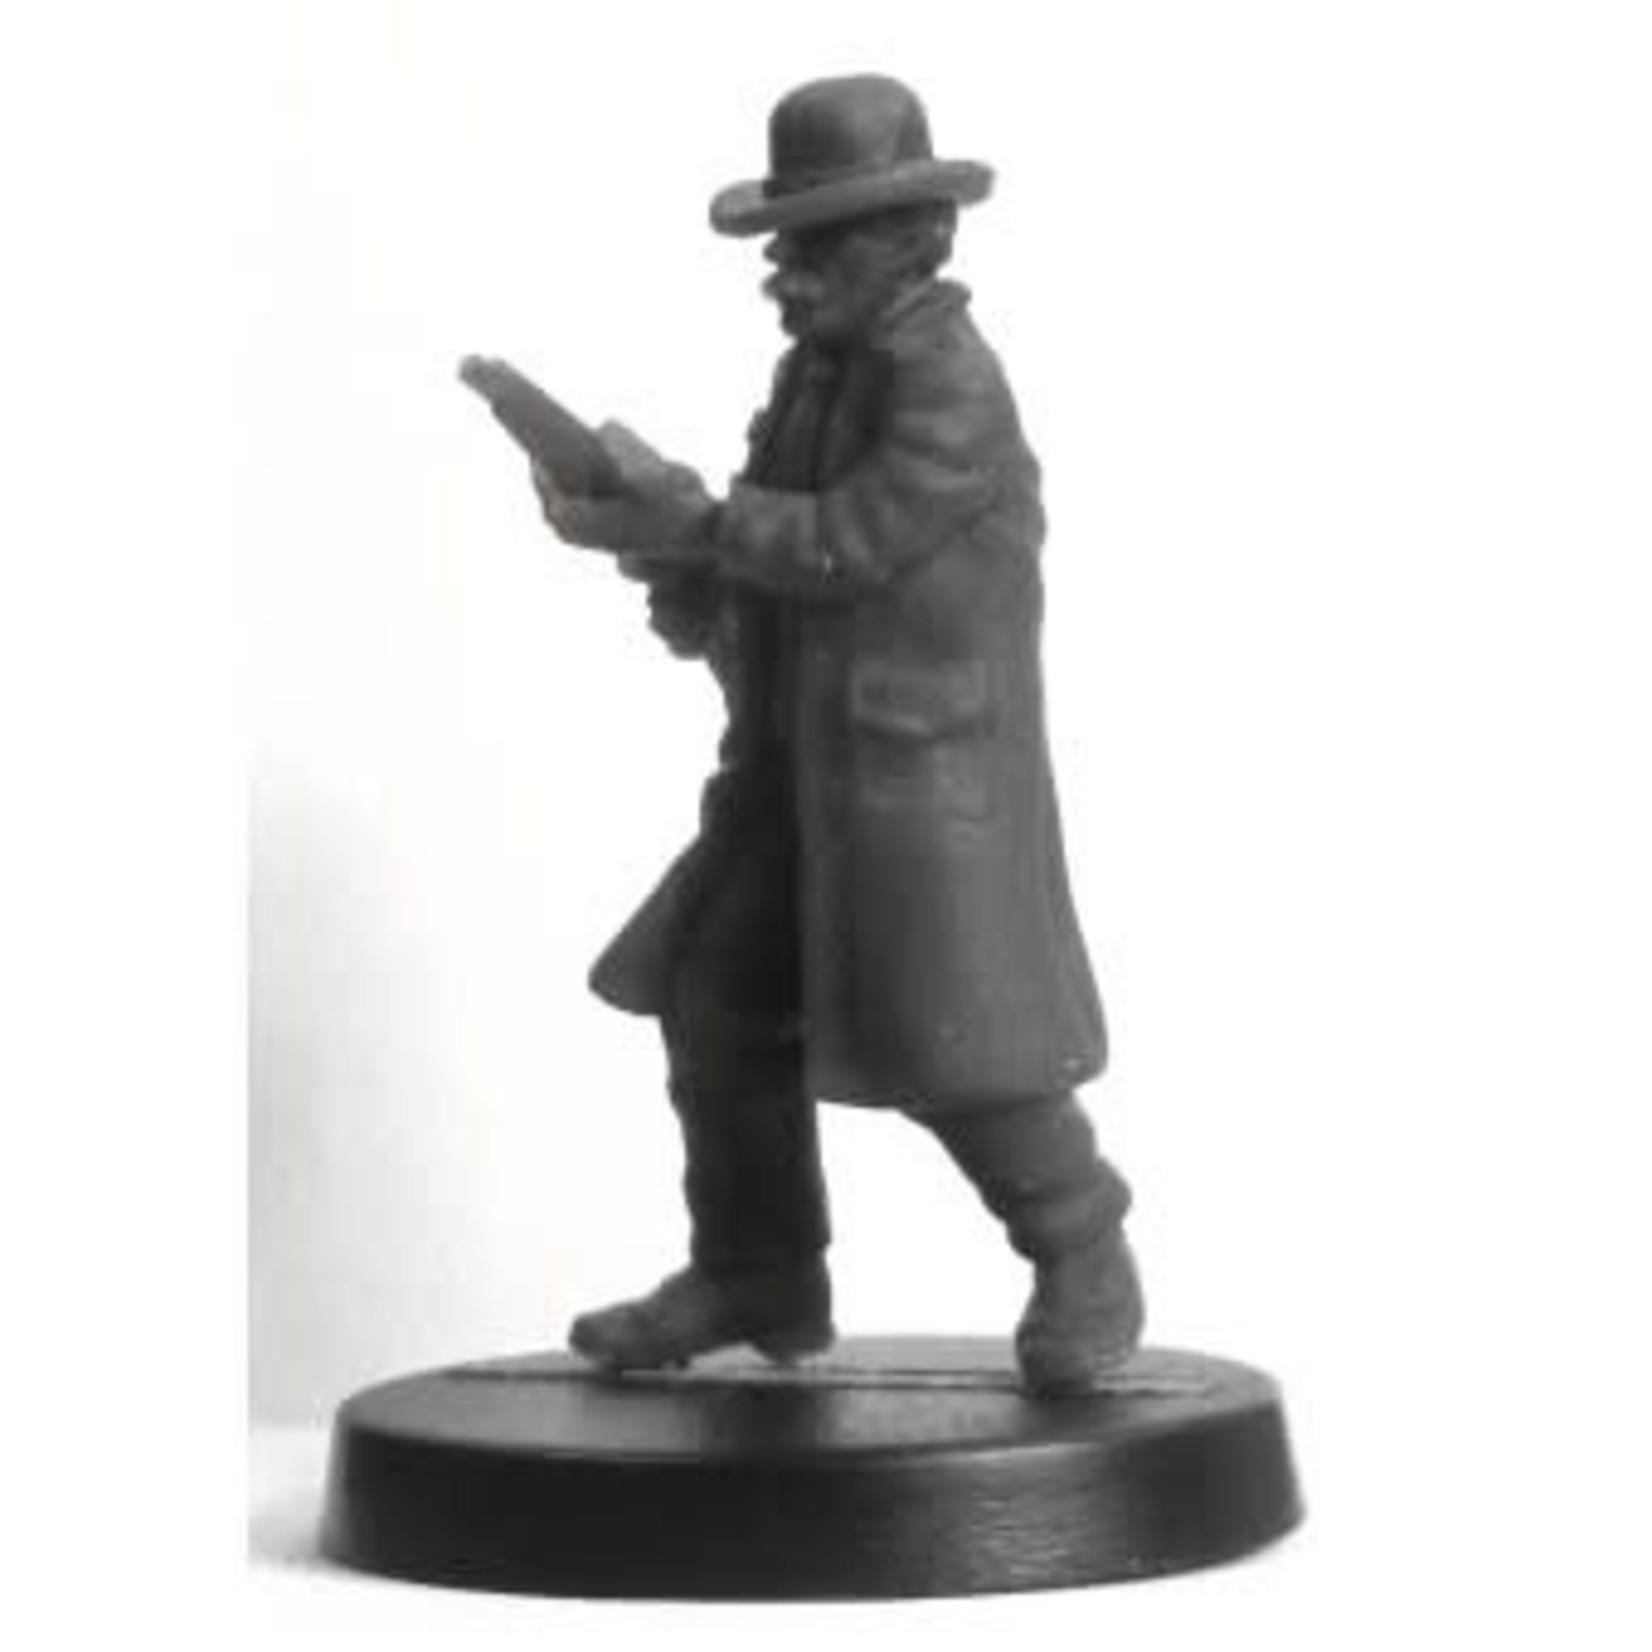 Pinkerton Agent